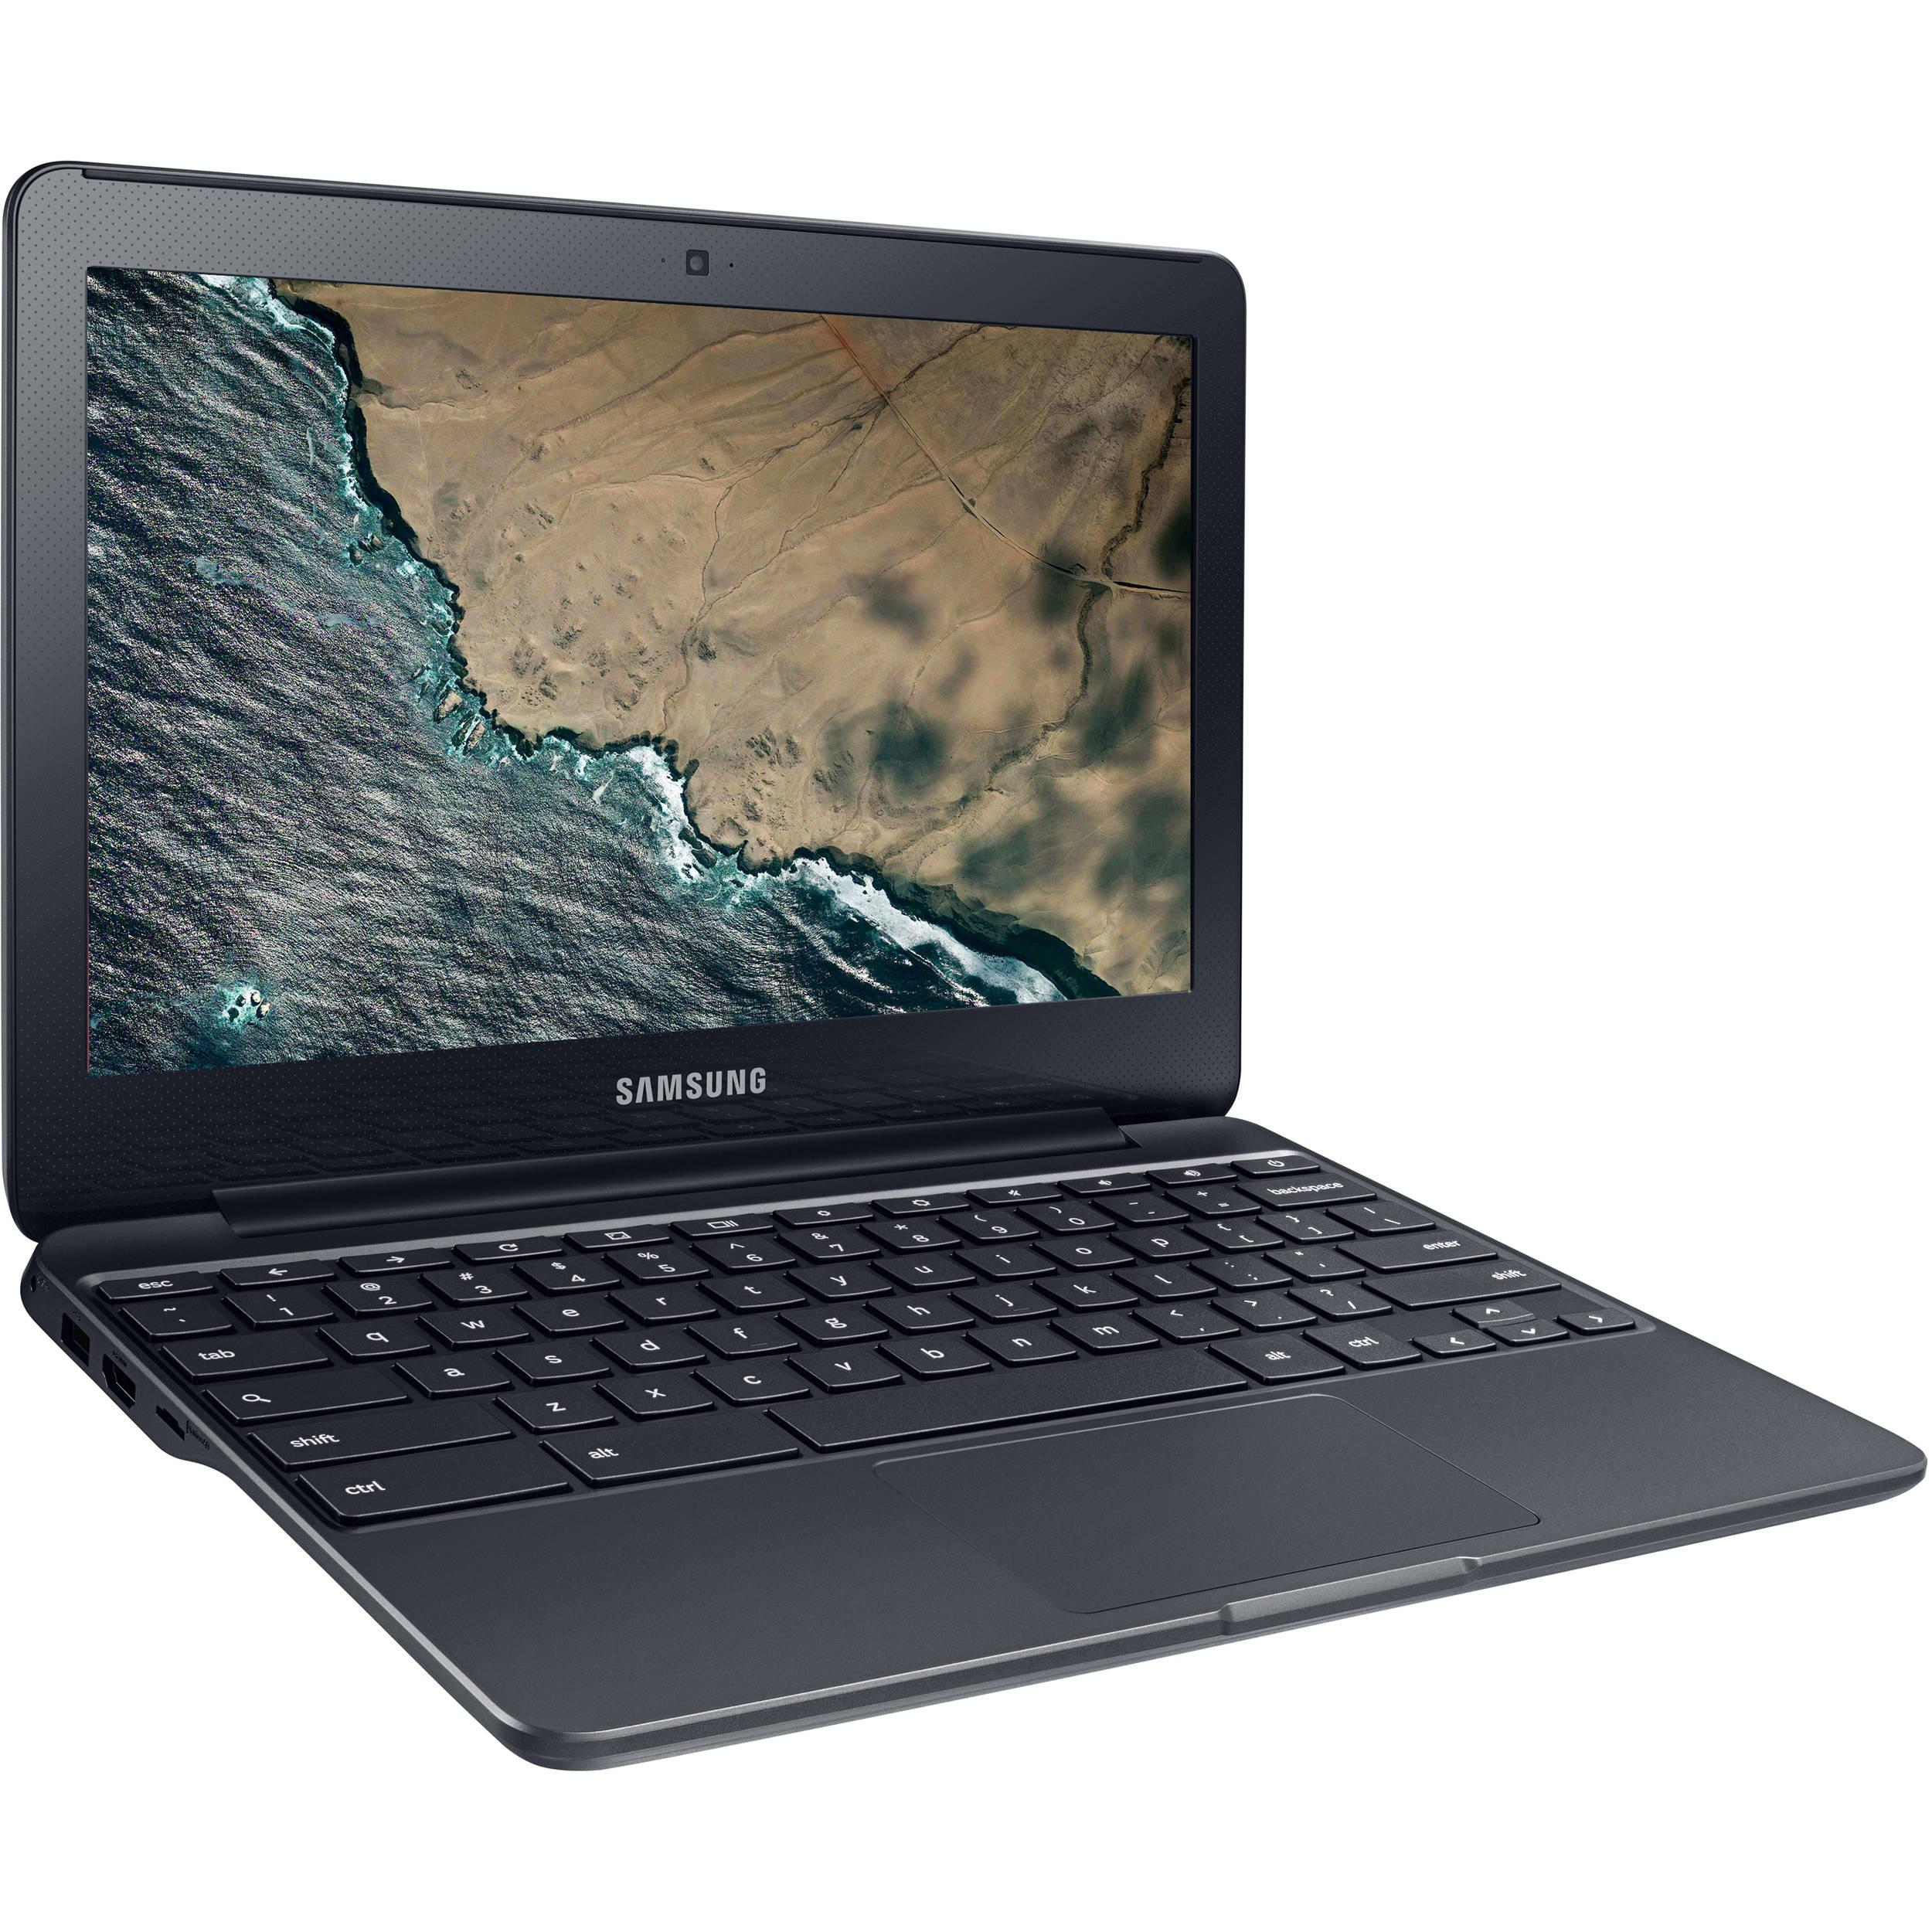 Samsung Chromebook Xe500C13-K04Us Celeron N3060 1.6 GHz 16GB eMMC - 4GB